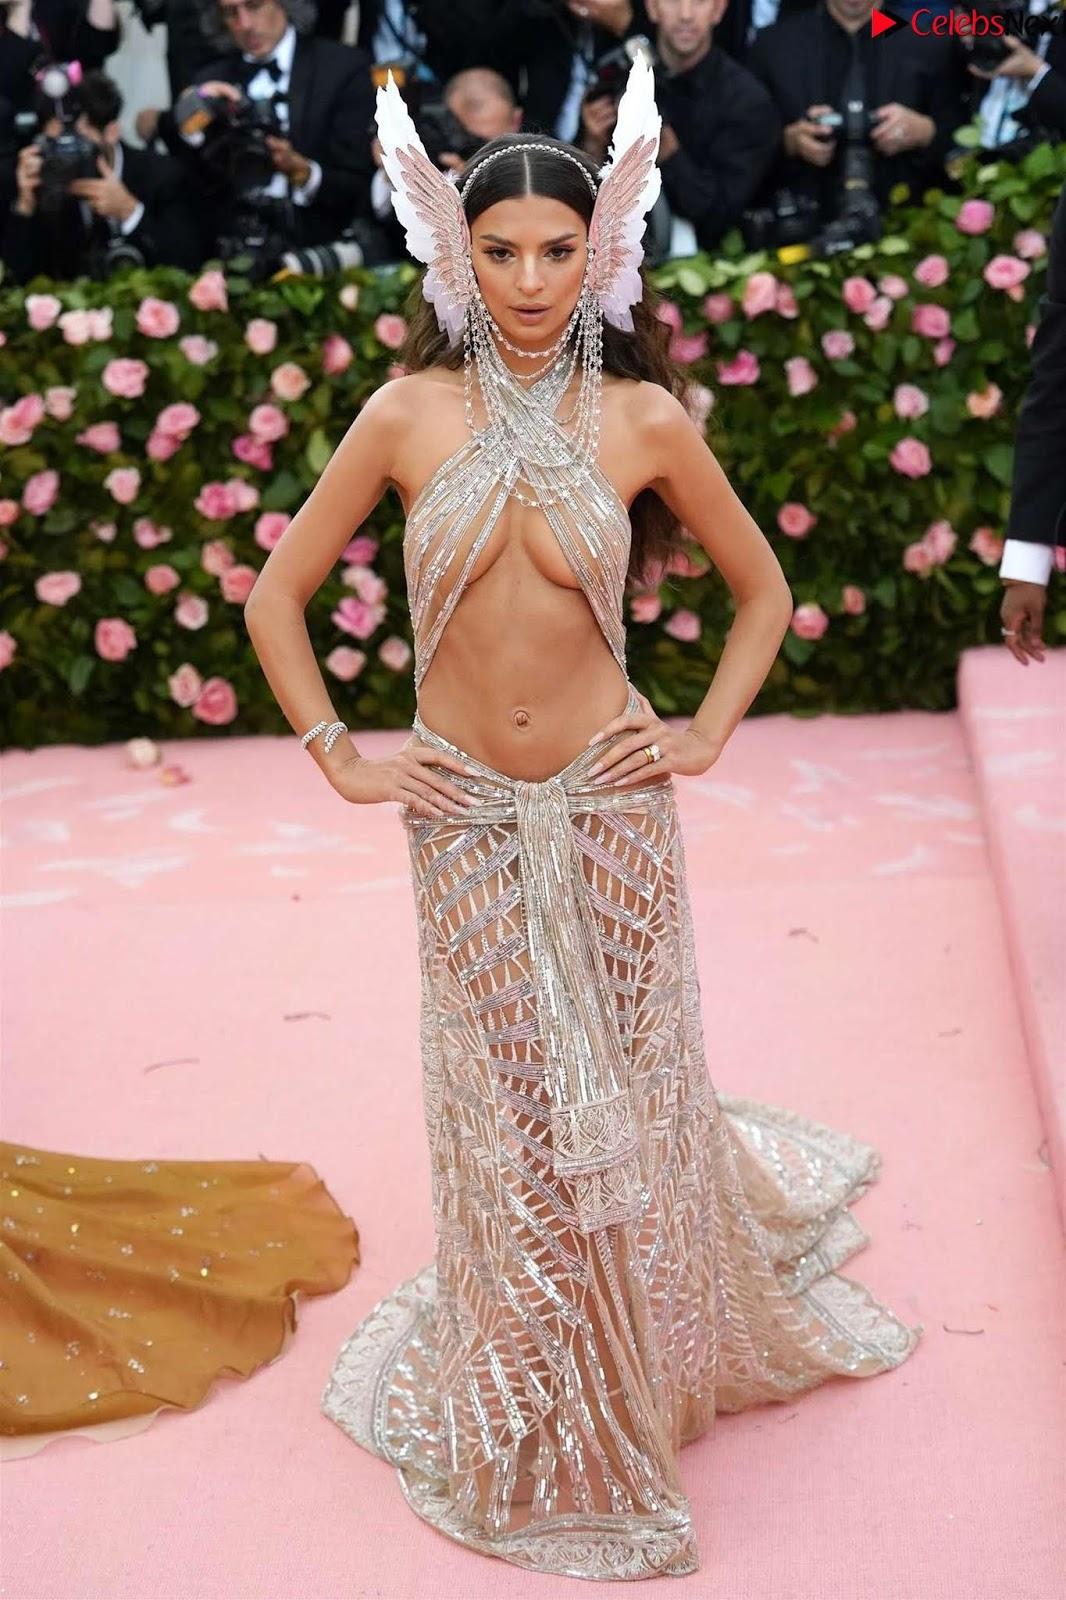 Emily Ratajkowski Expising her beautiful tits at 2019 MET Gala in NYC CelebSneXt.xyz Exclusive Pics